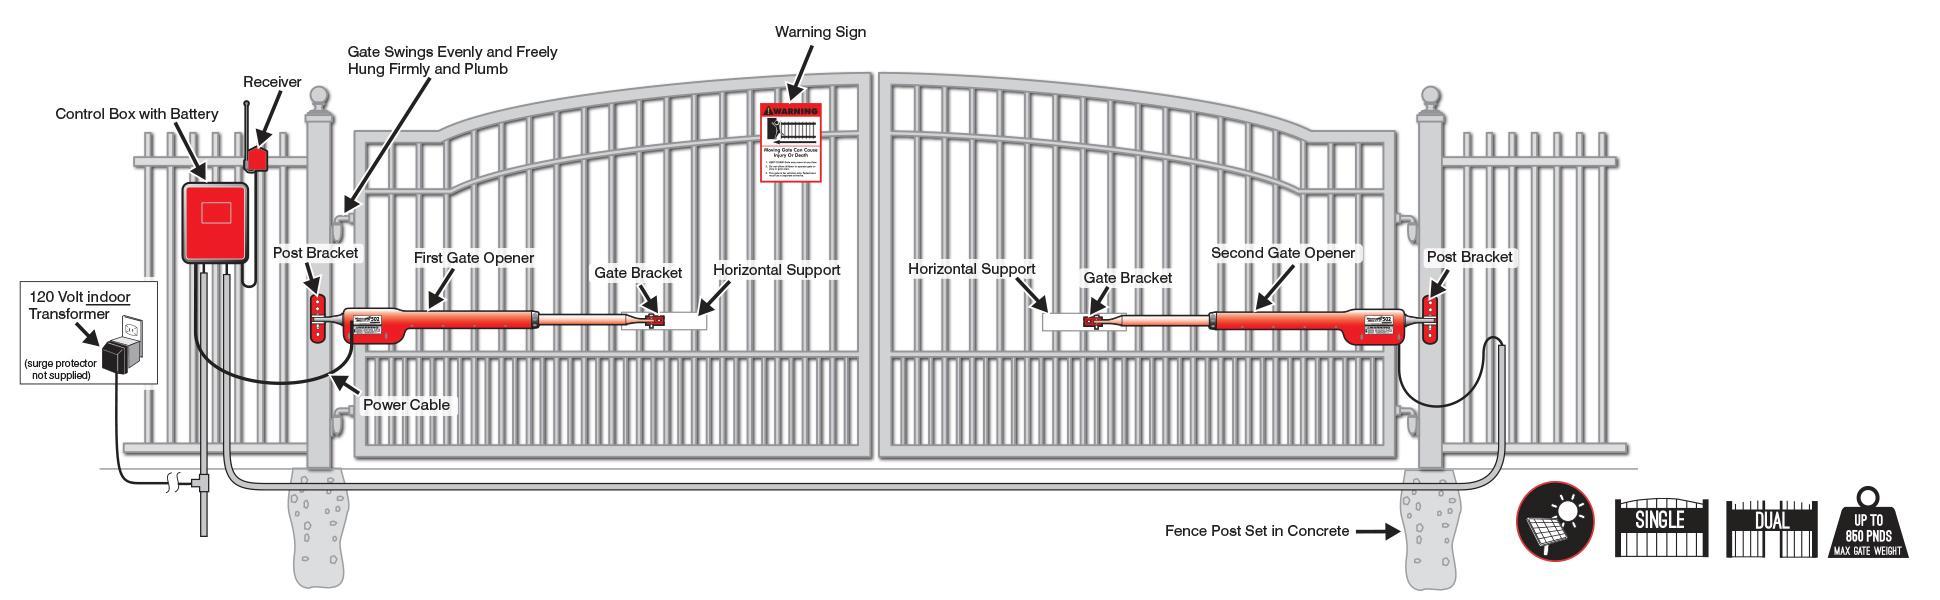 Awesome Kawasaki Mule 3010 Wiring Diagram Images - Everything You ...